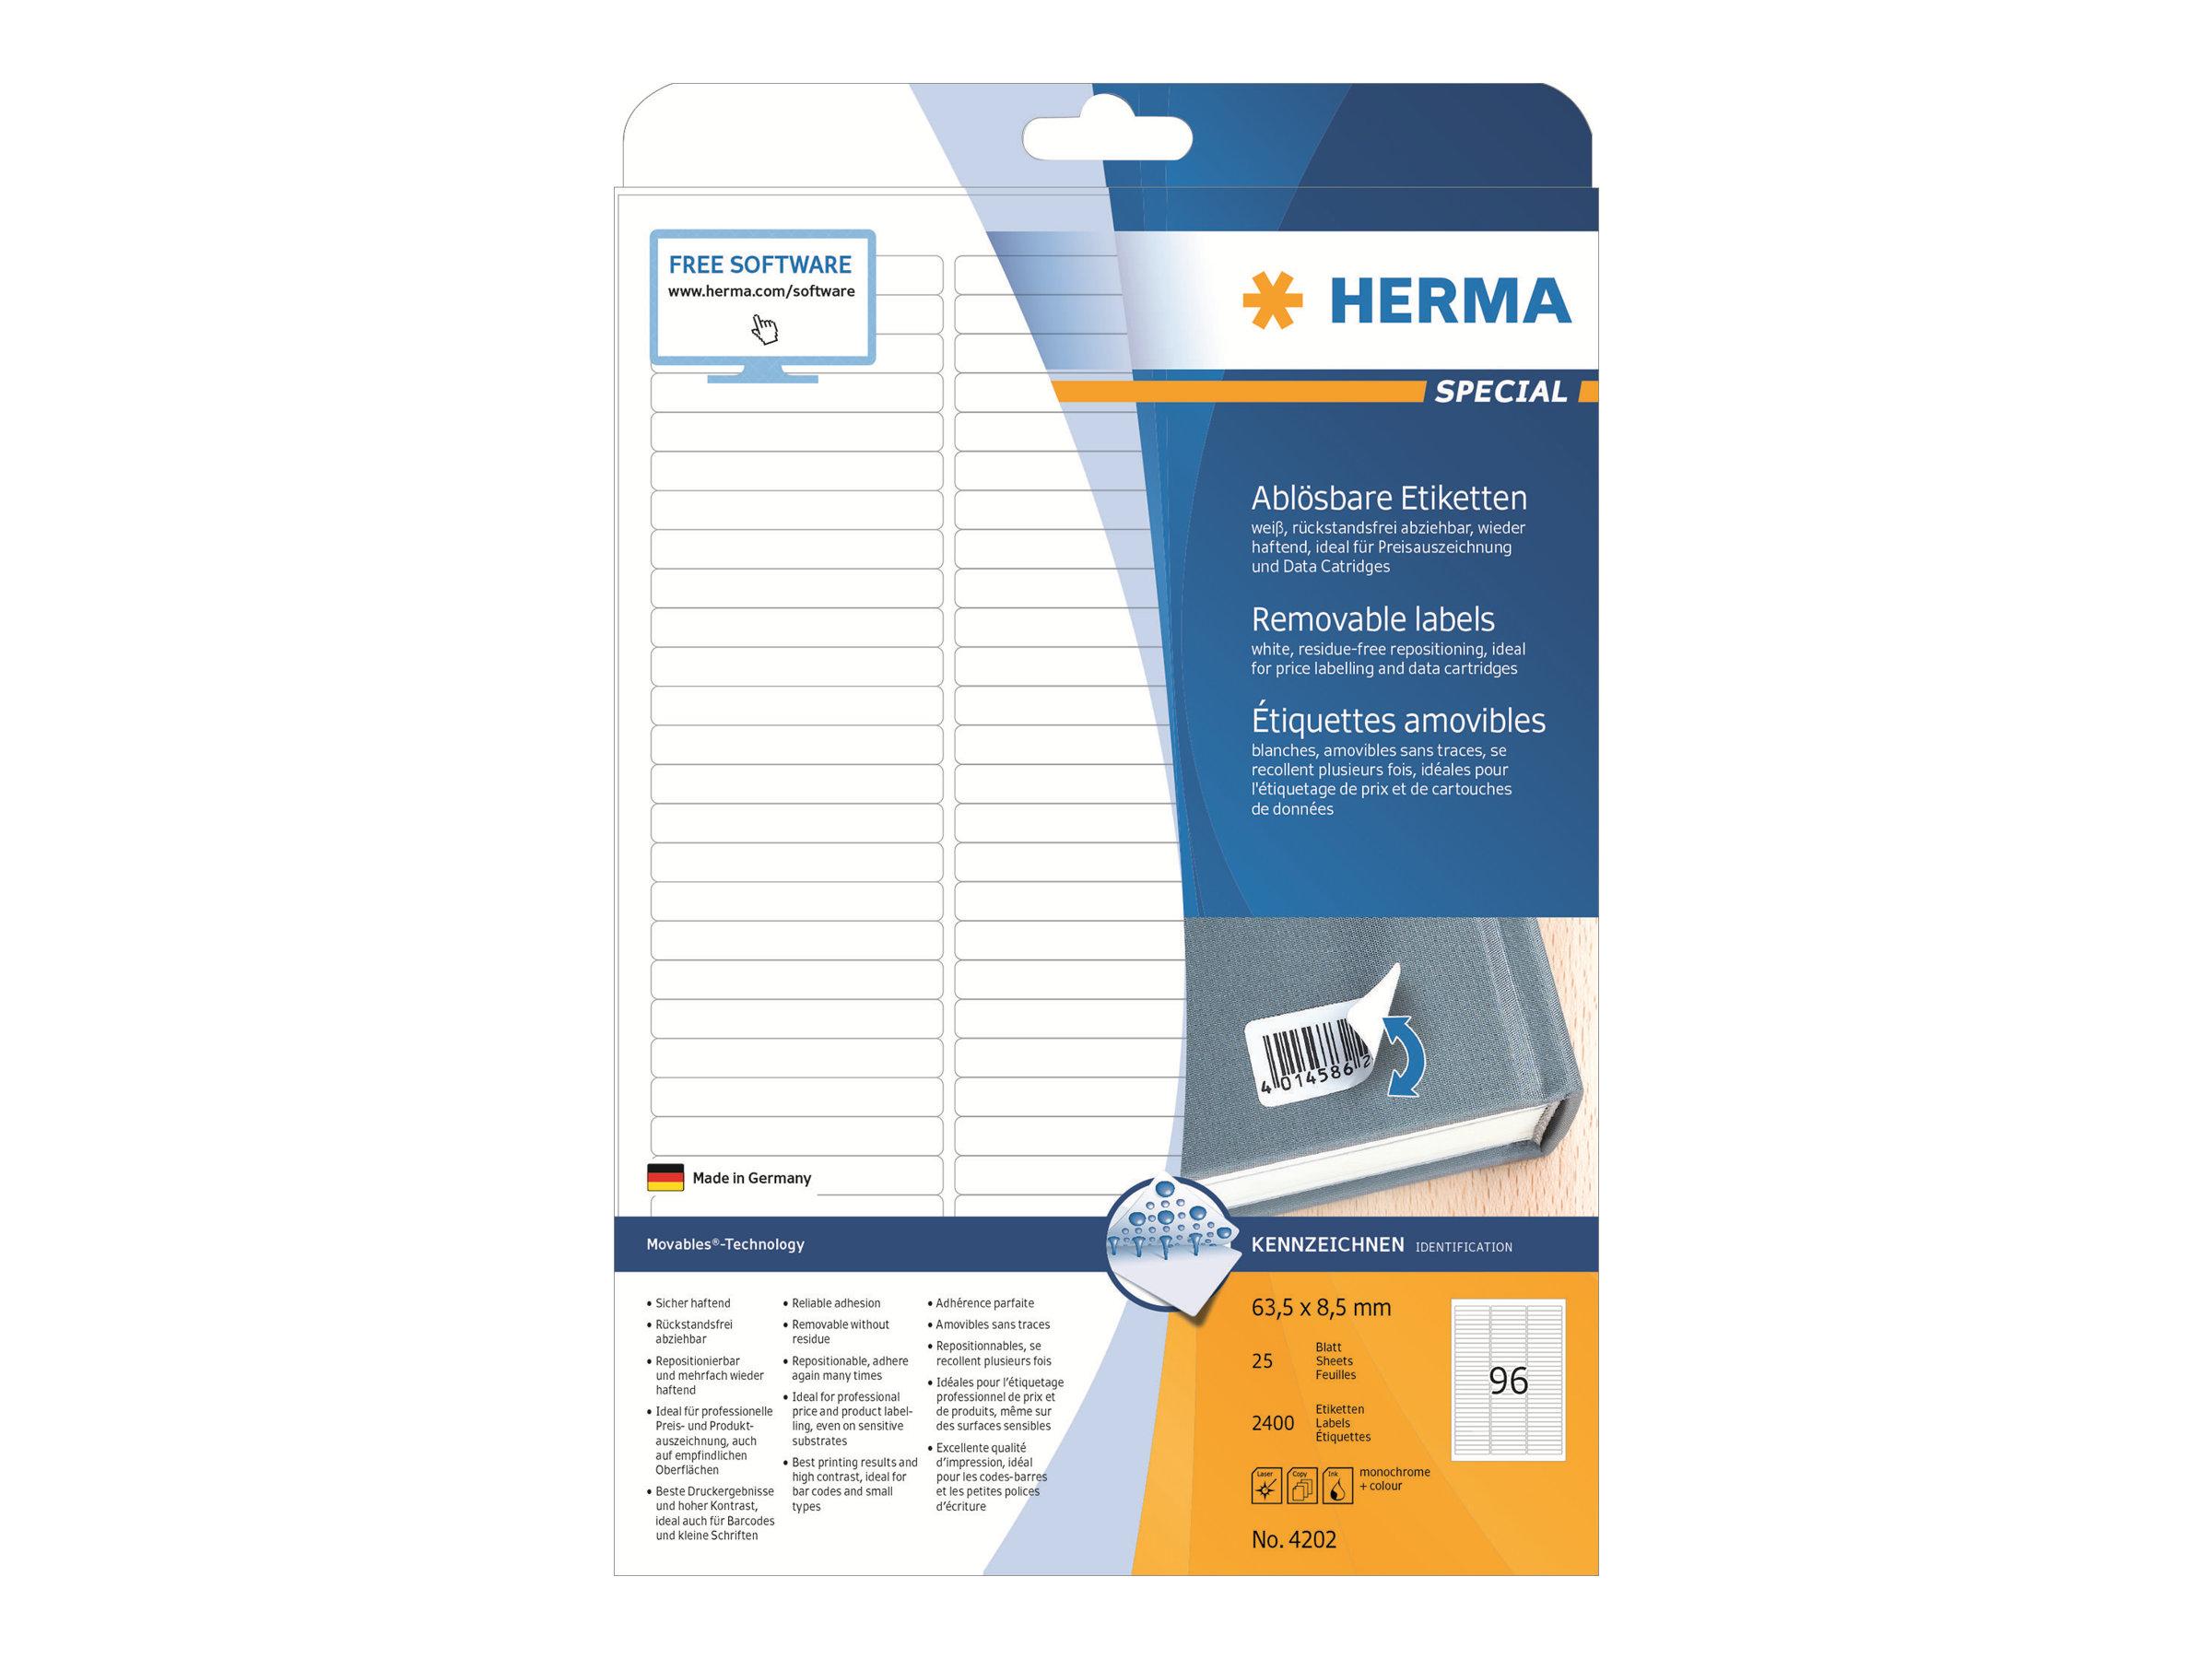 Vorschau: HERMA Special - Papier - matt